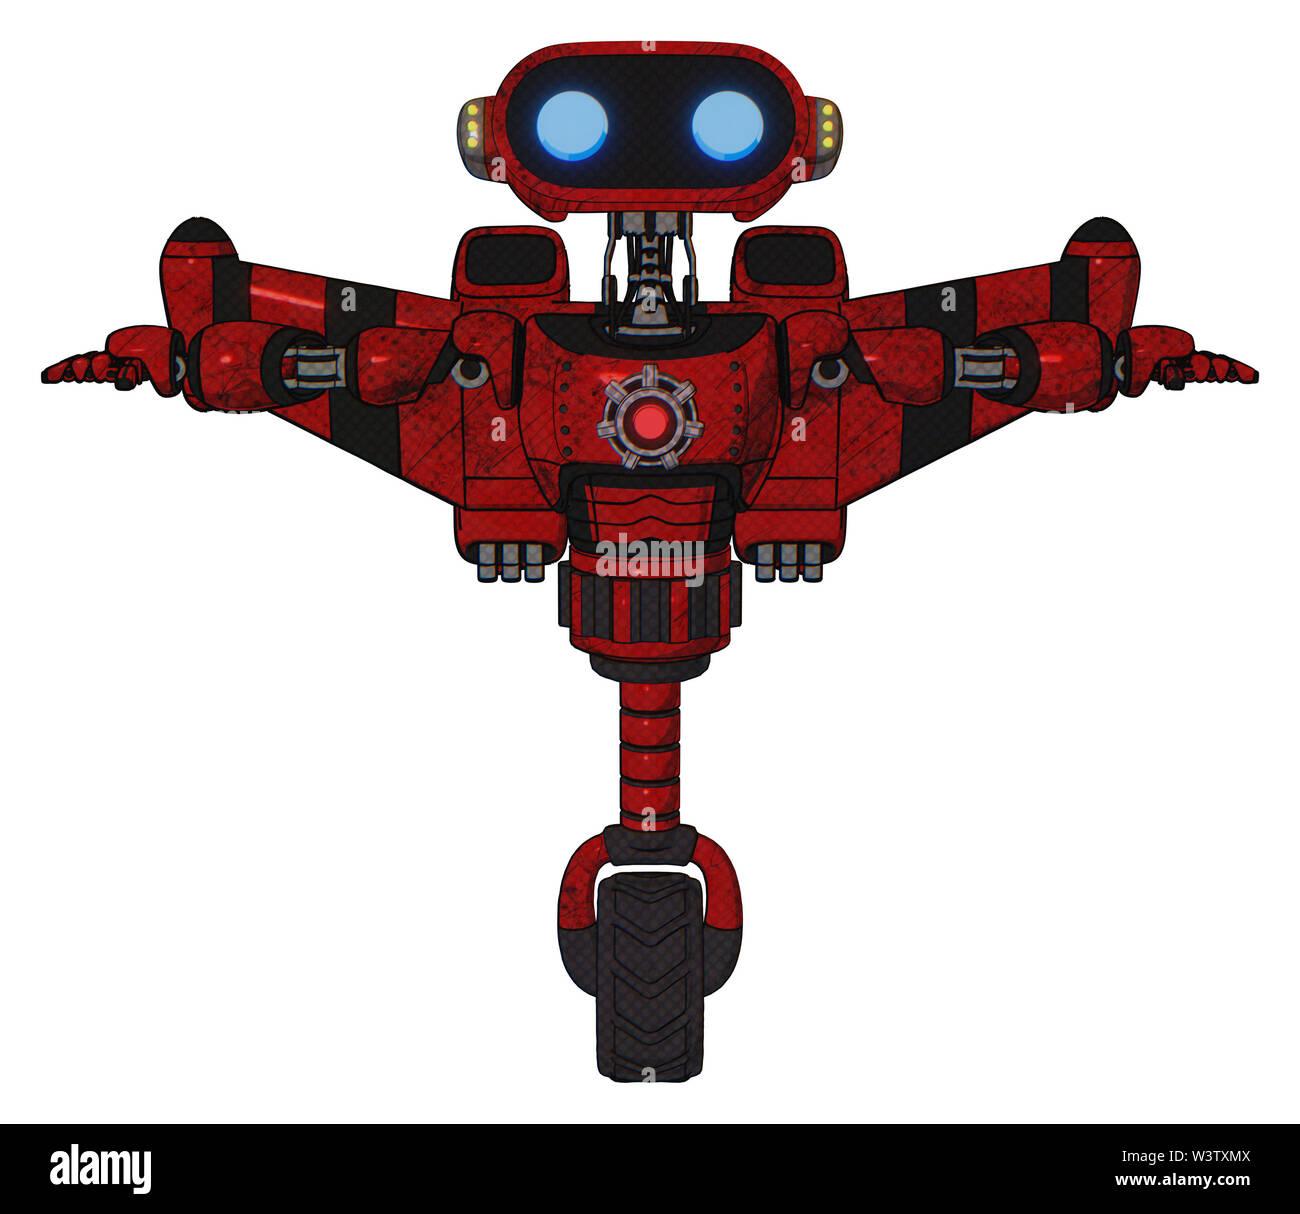 Bot containing elements: dual retro camera head, cute retro robo head, yellow head leds, light chest exoshielding, red energy core, stellar jet wing r - Stock Image